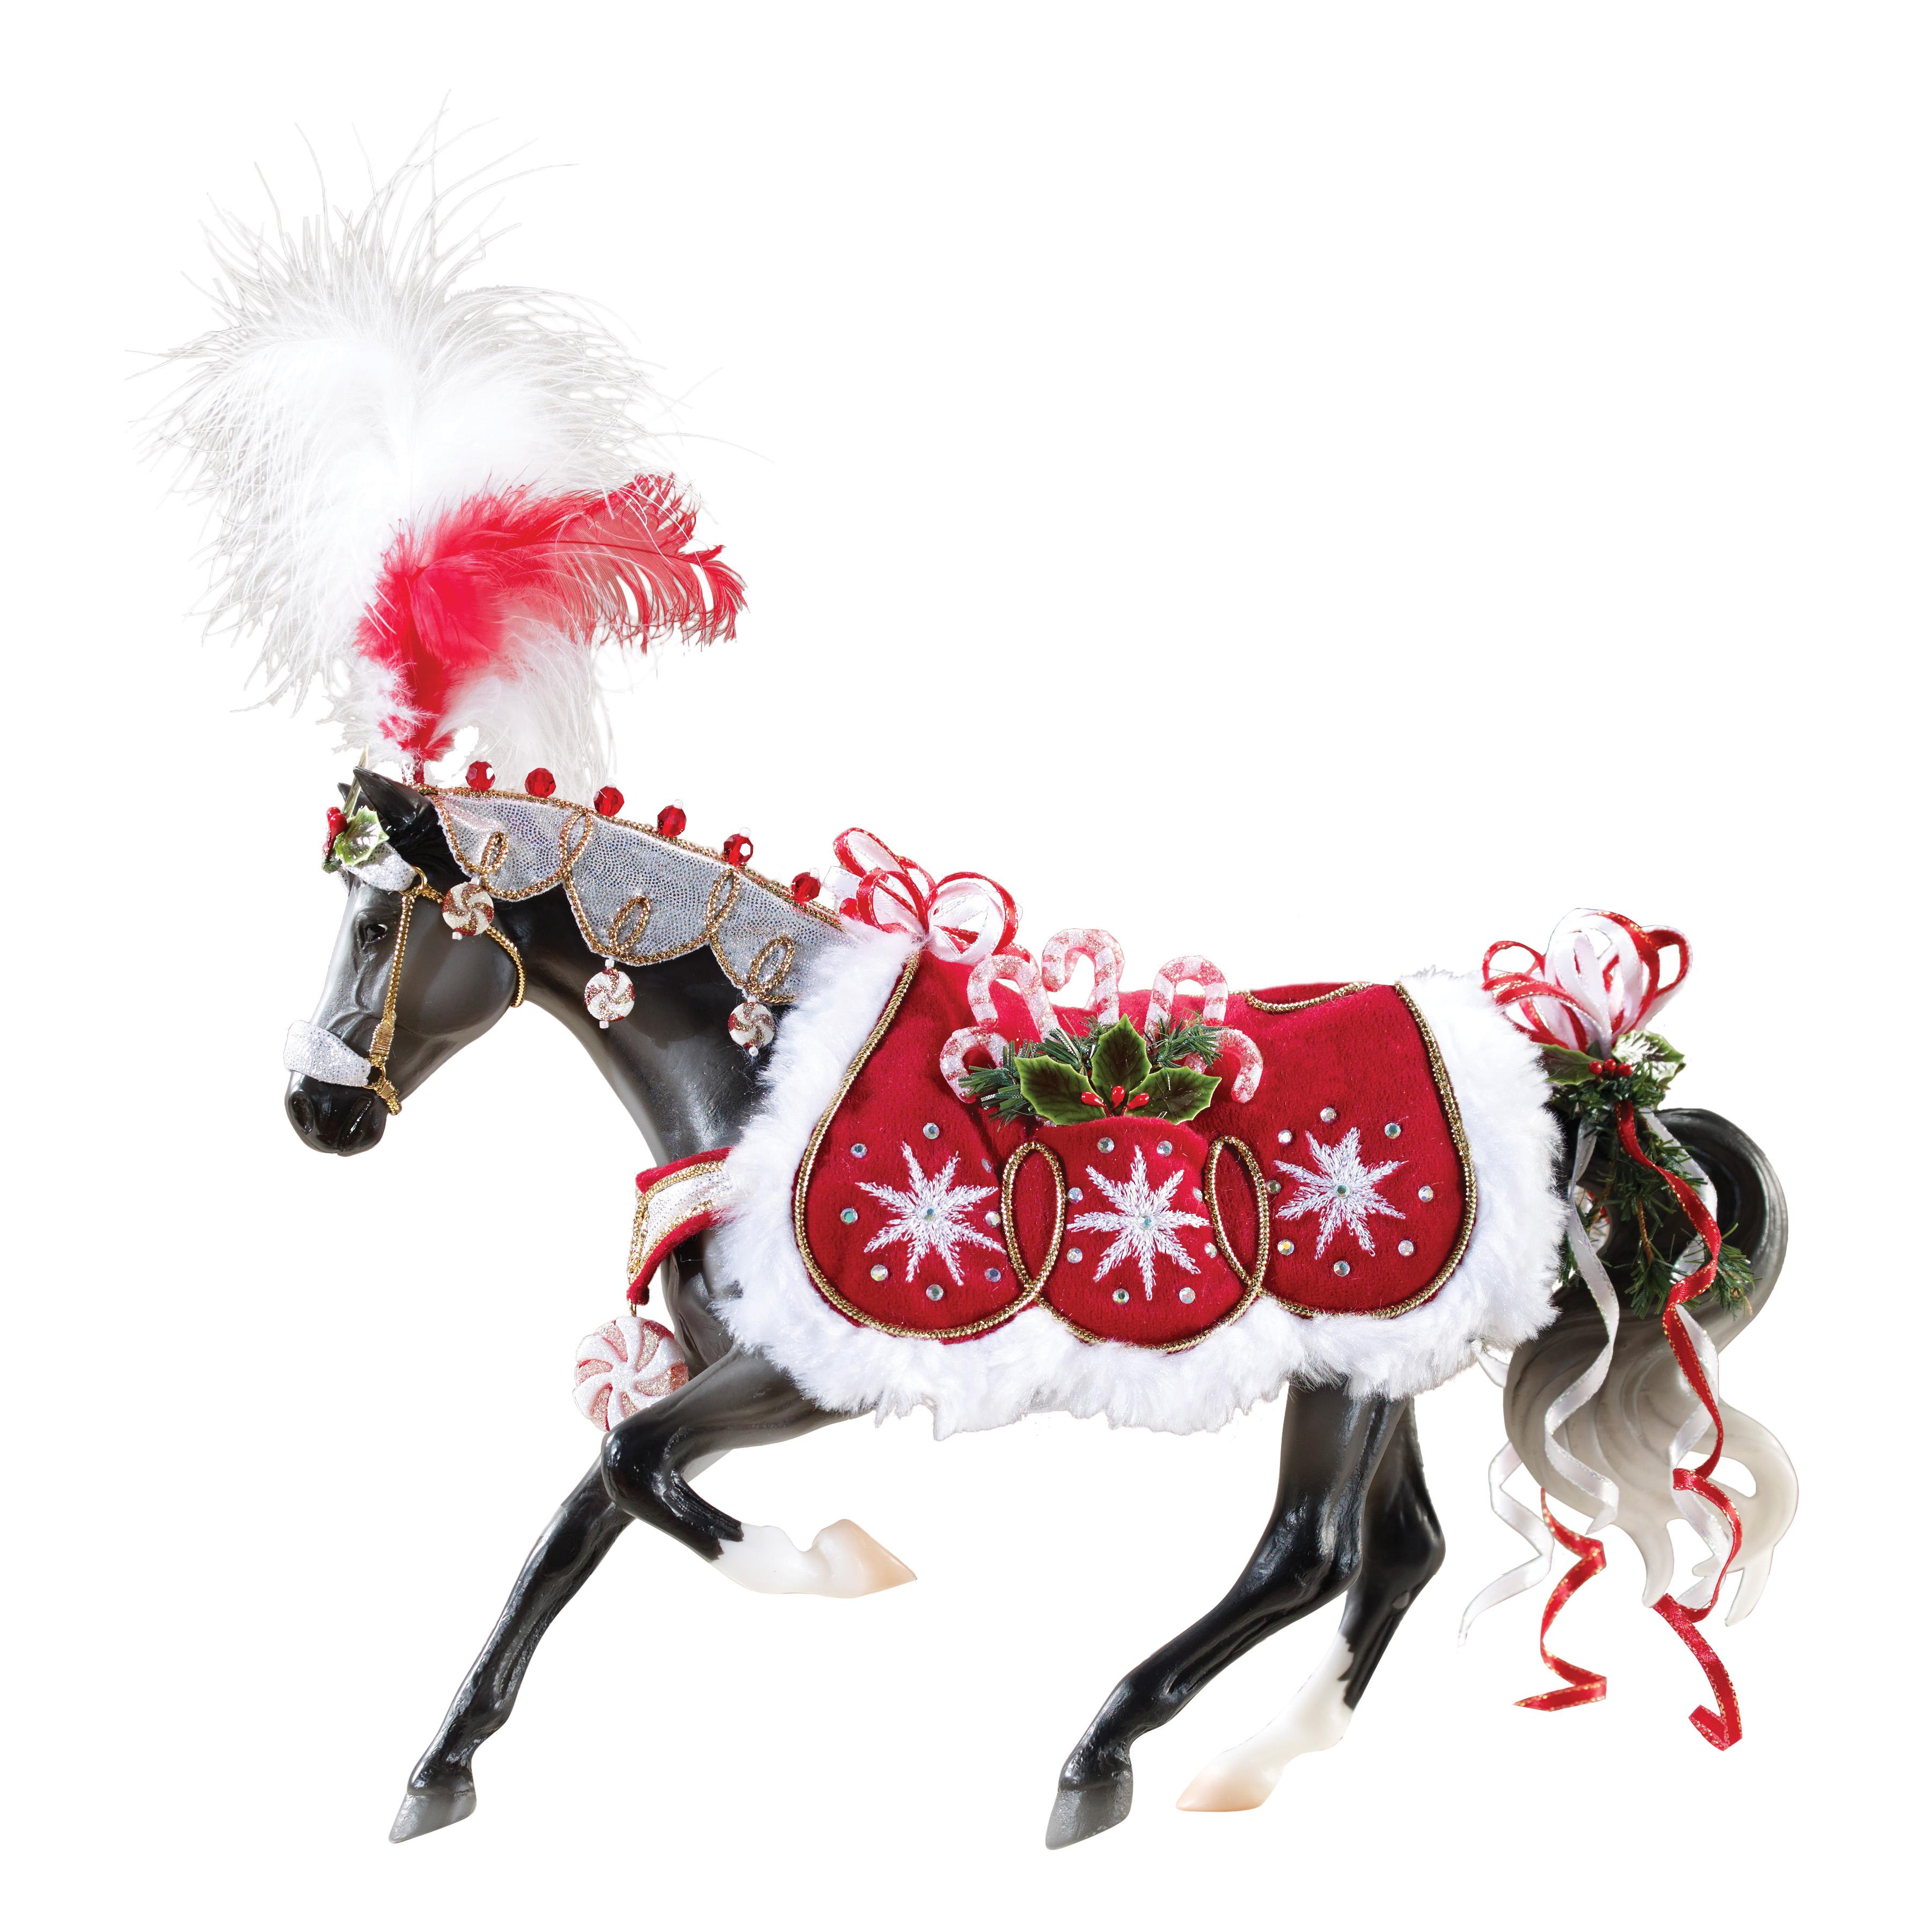 Breyer Peppermint Kiss 2015 Holiday Horse